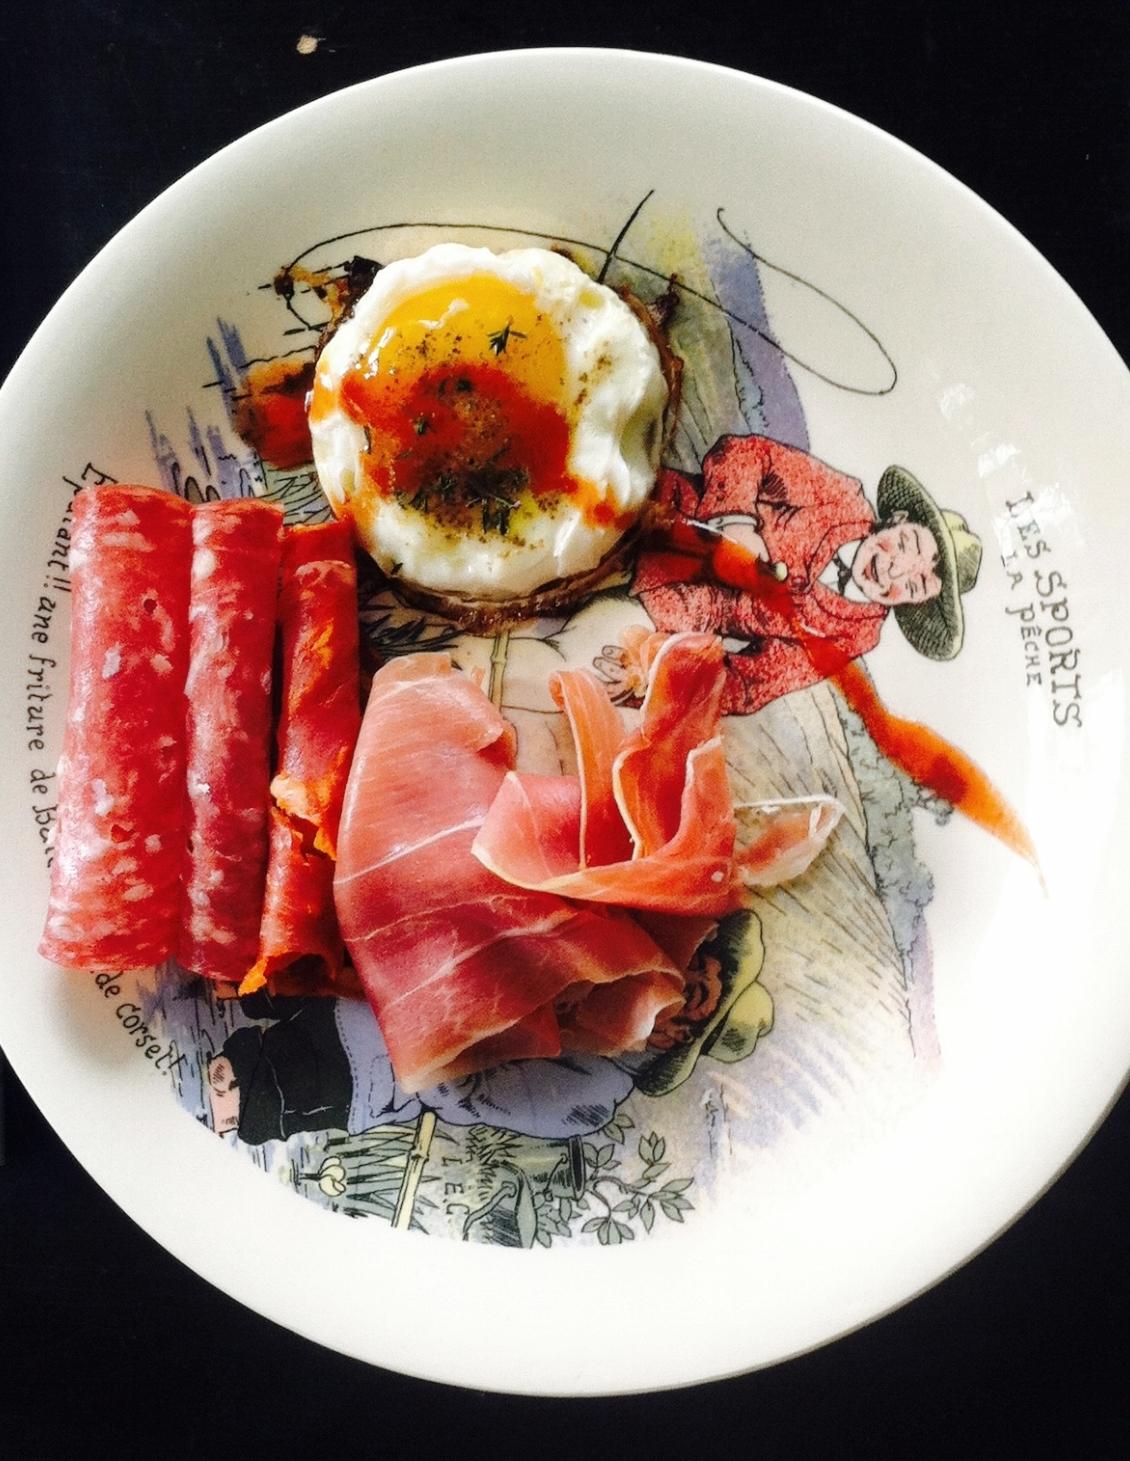 Breakfast meats hisandherskitchen.com.jpg